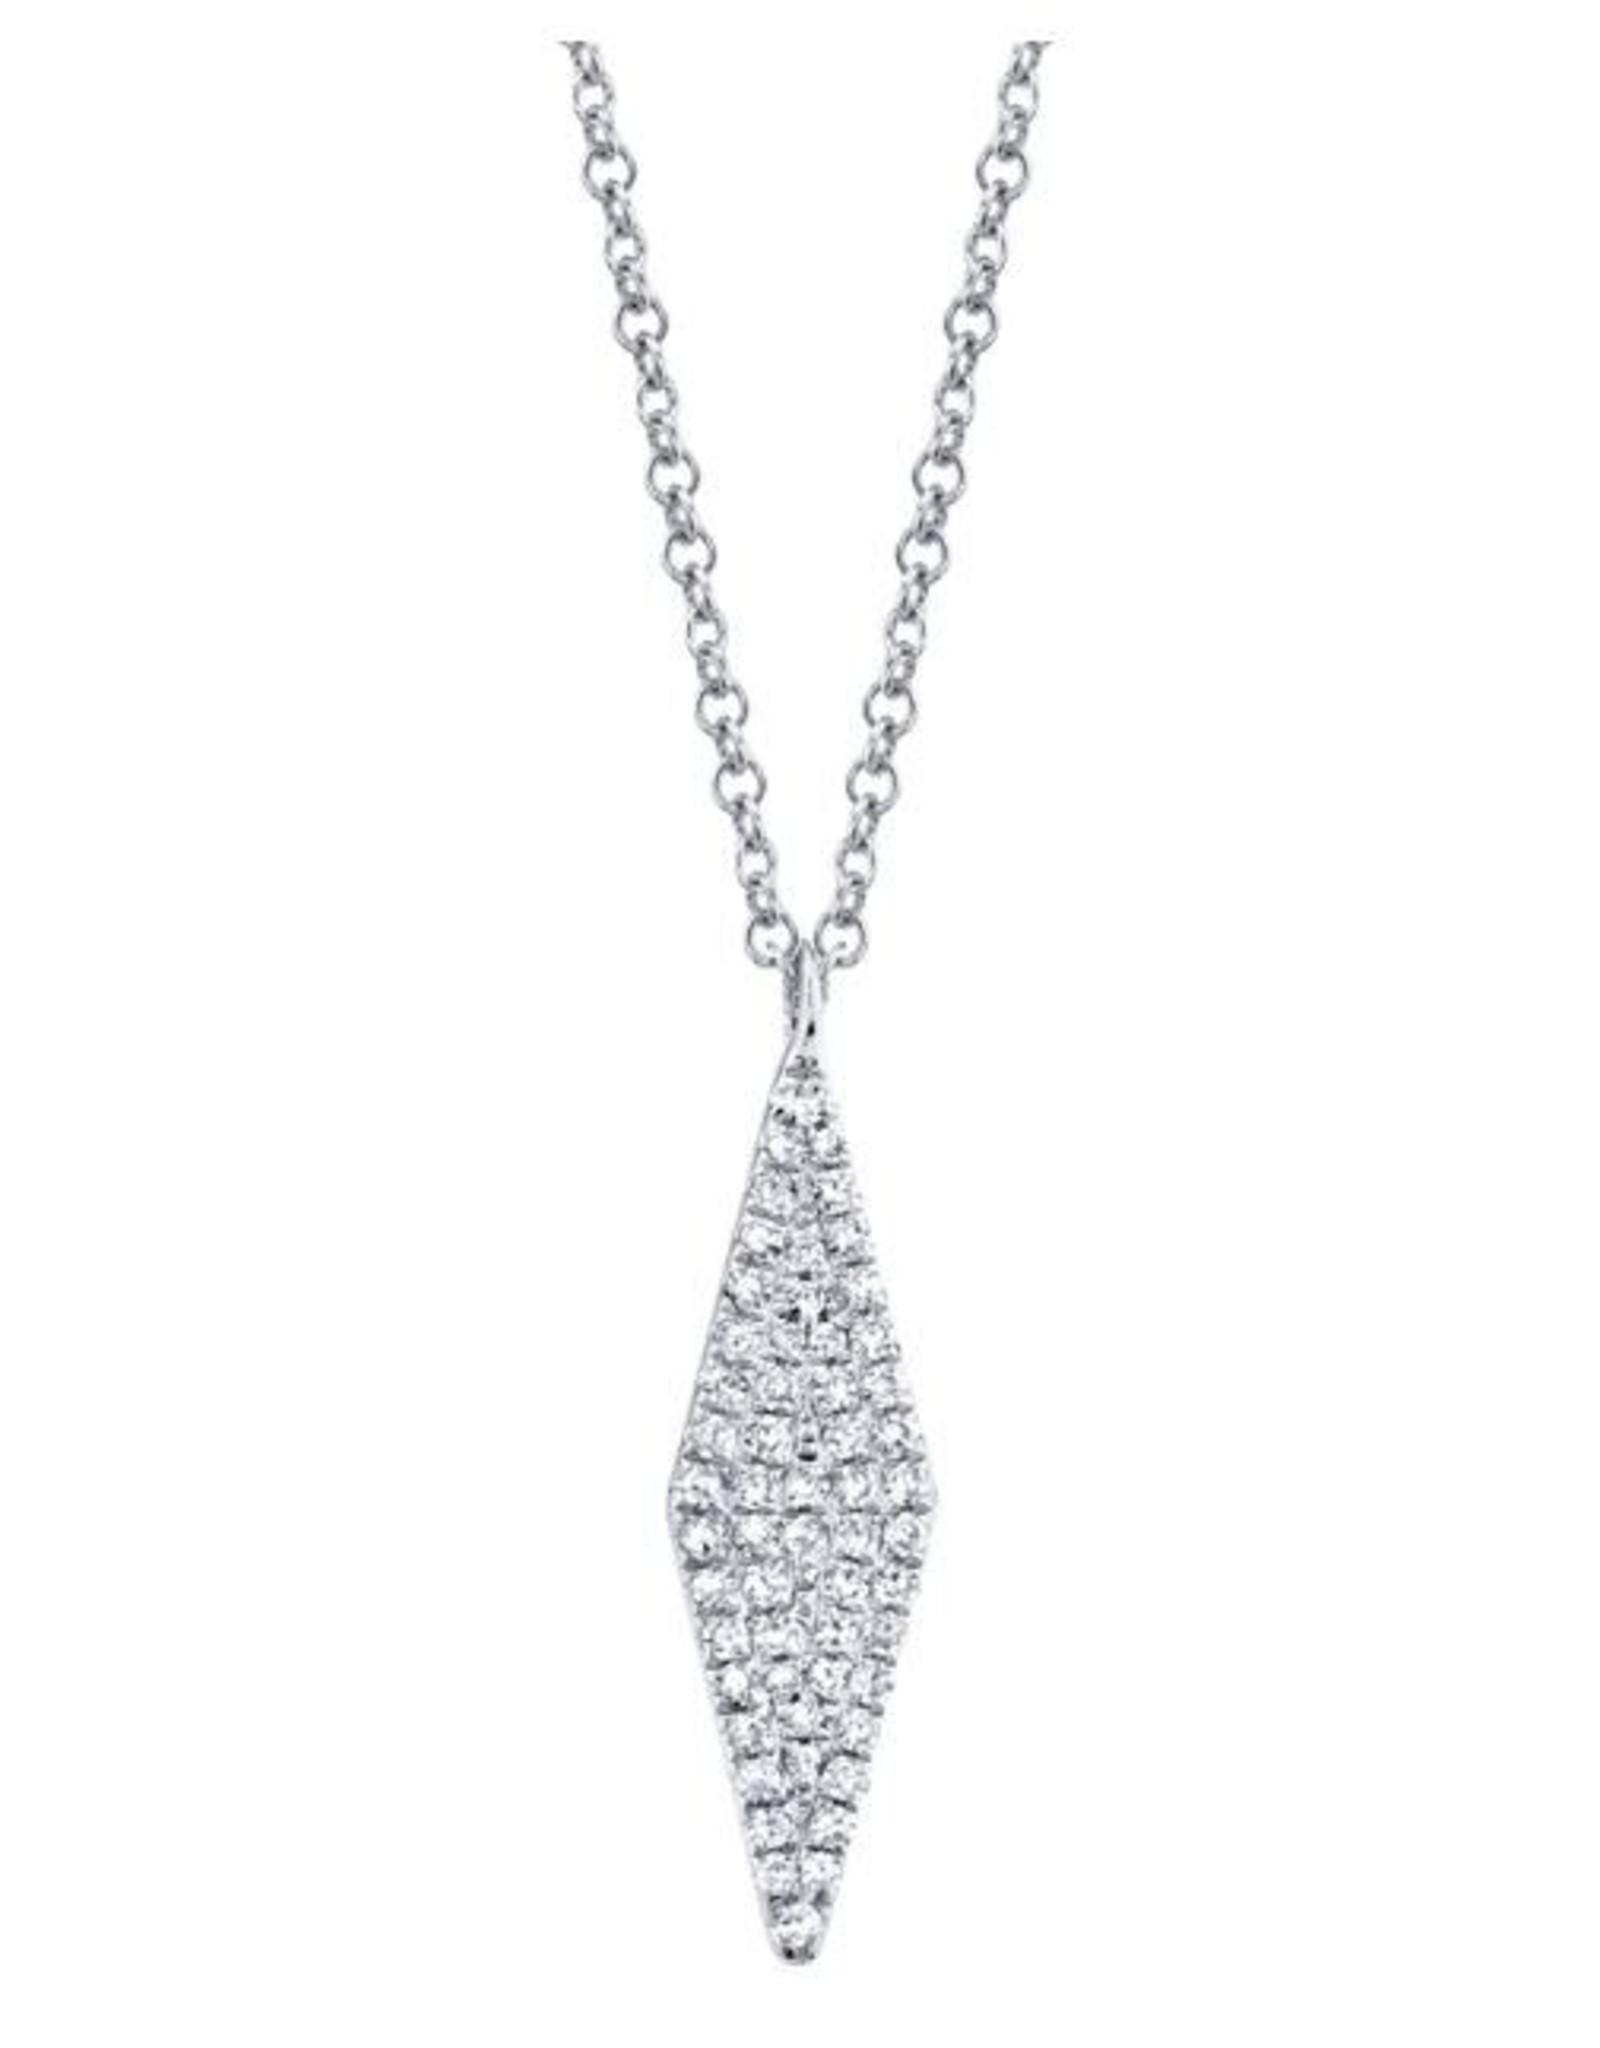 14K White Gold  Diamond Pave Kite Necklace, D: 0.17ct